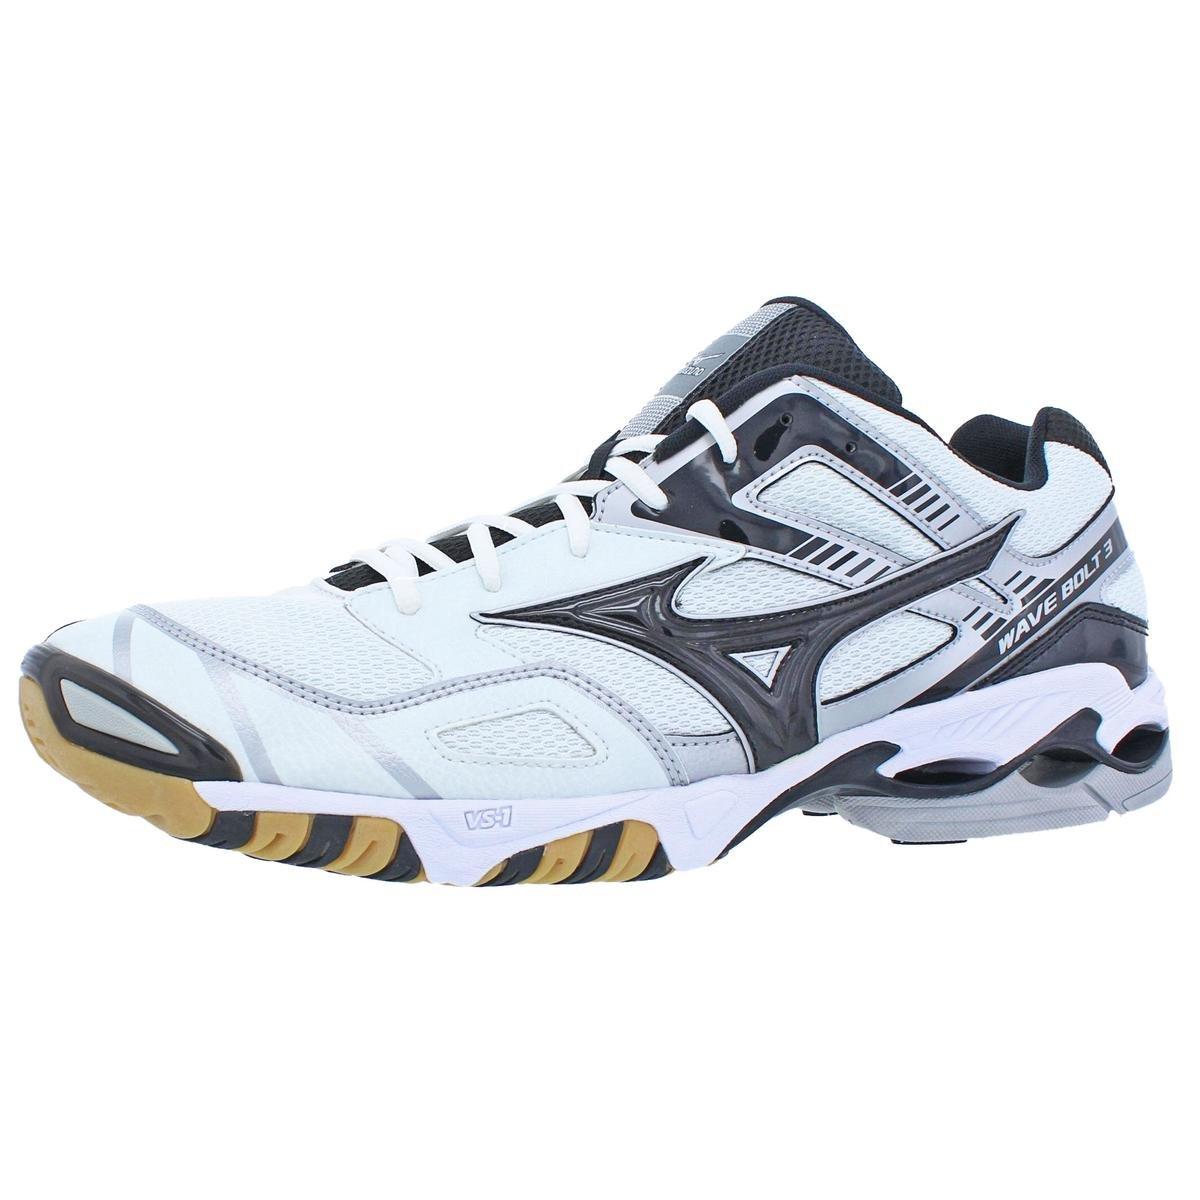 Mizuno Men's Wave Bolt 3 Volleyball Shoe,White/Black,16 M US by Mizuno